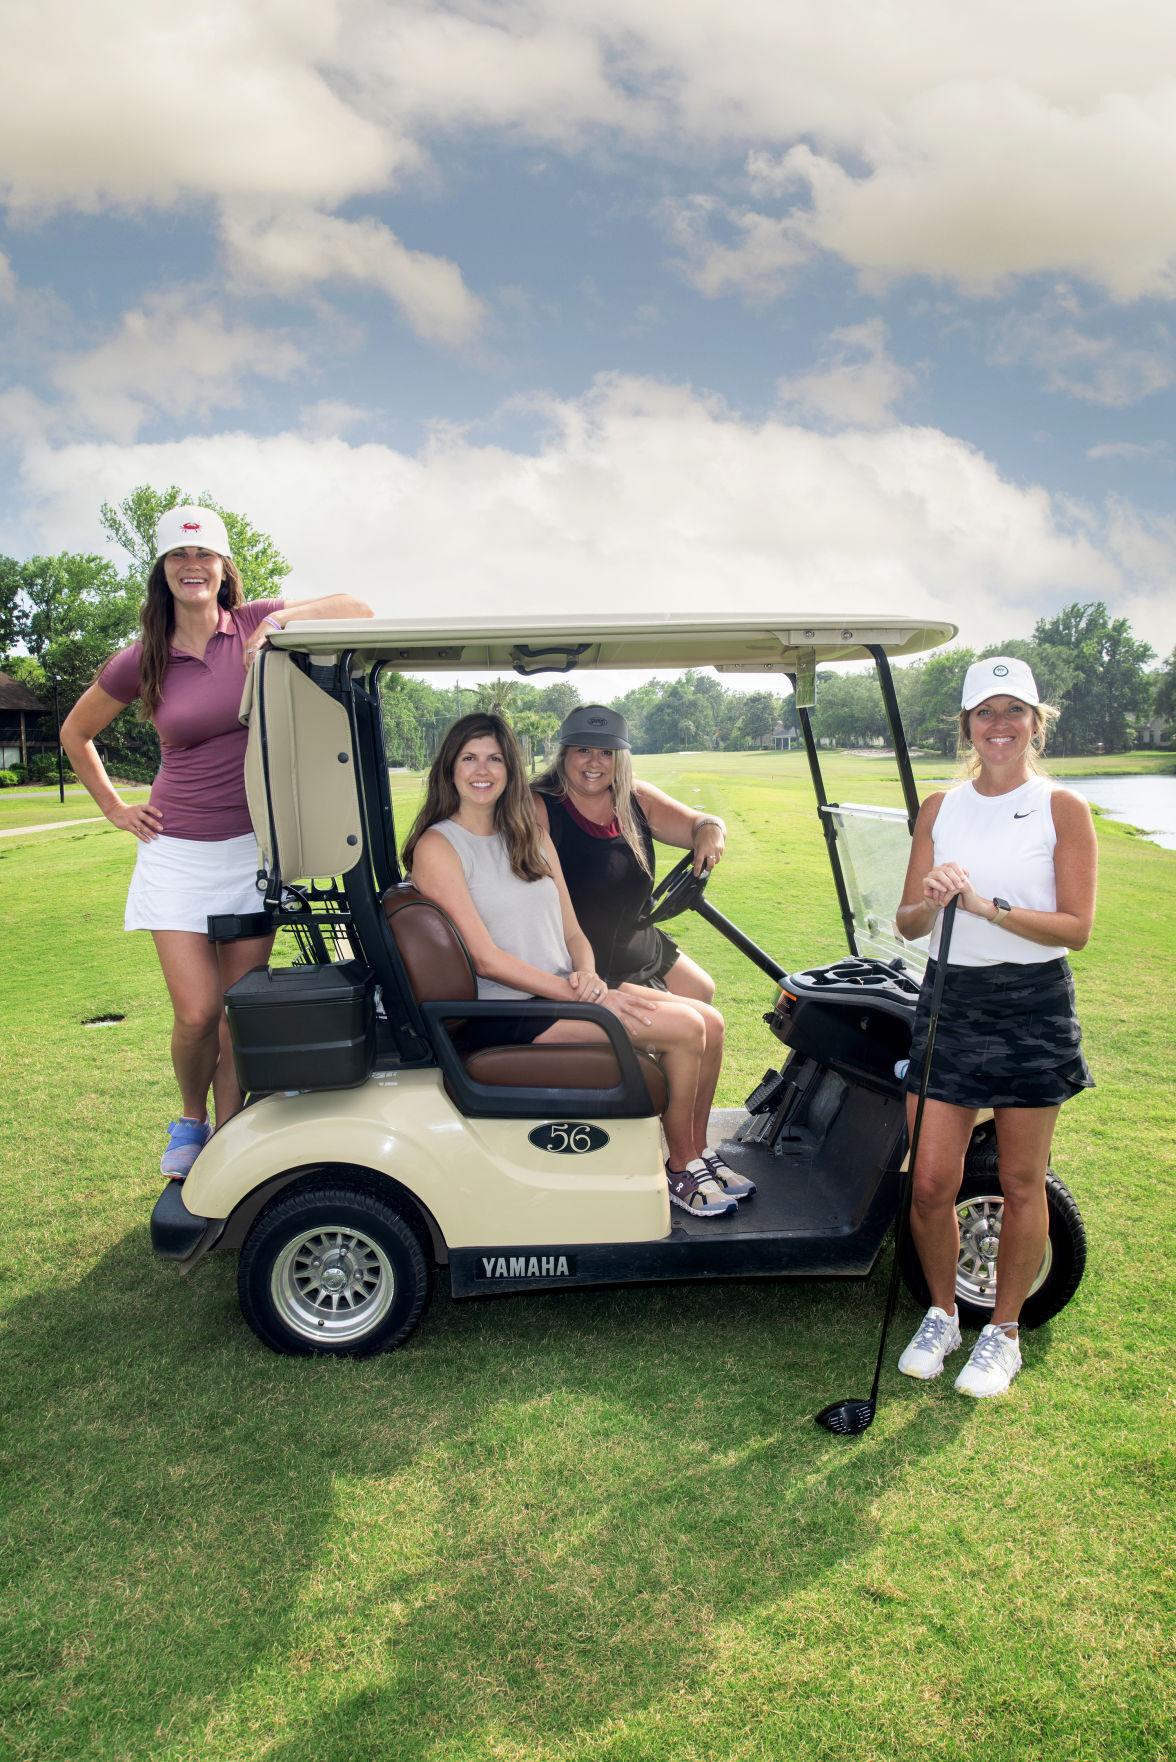 CIFEATURE_Golfing Ladies-Final.jpg